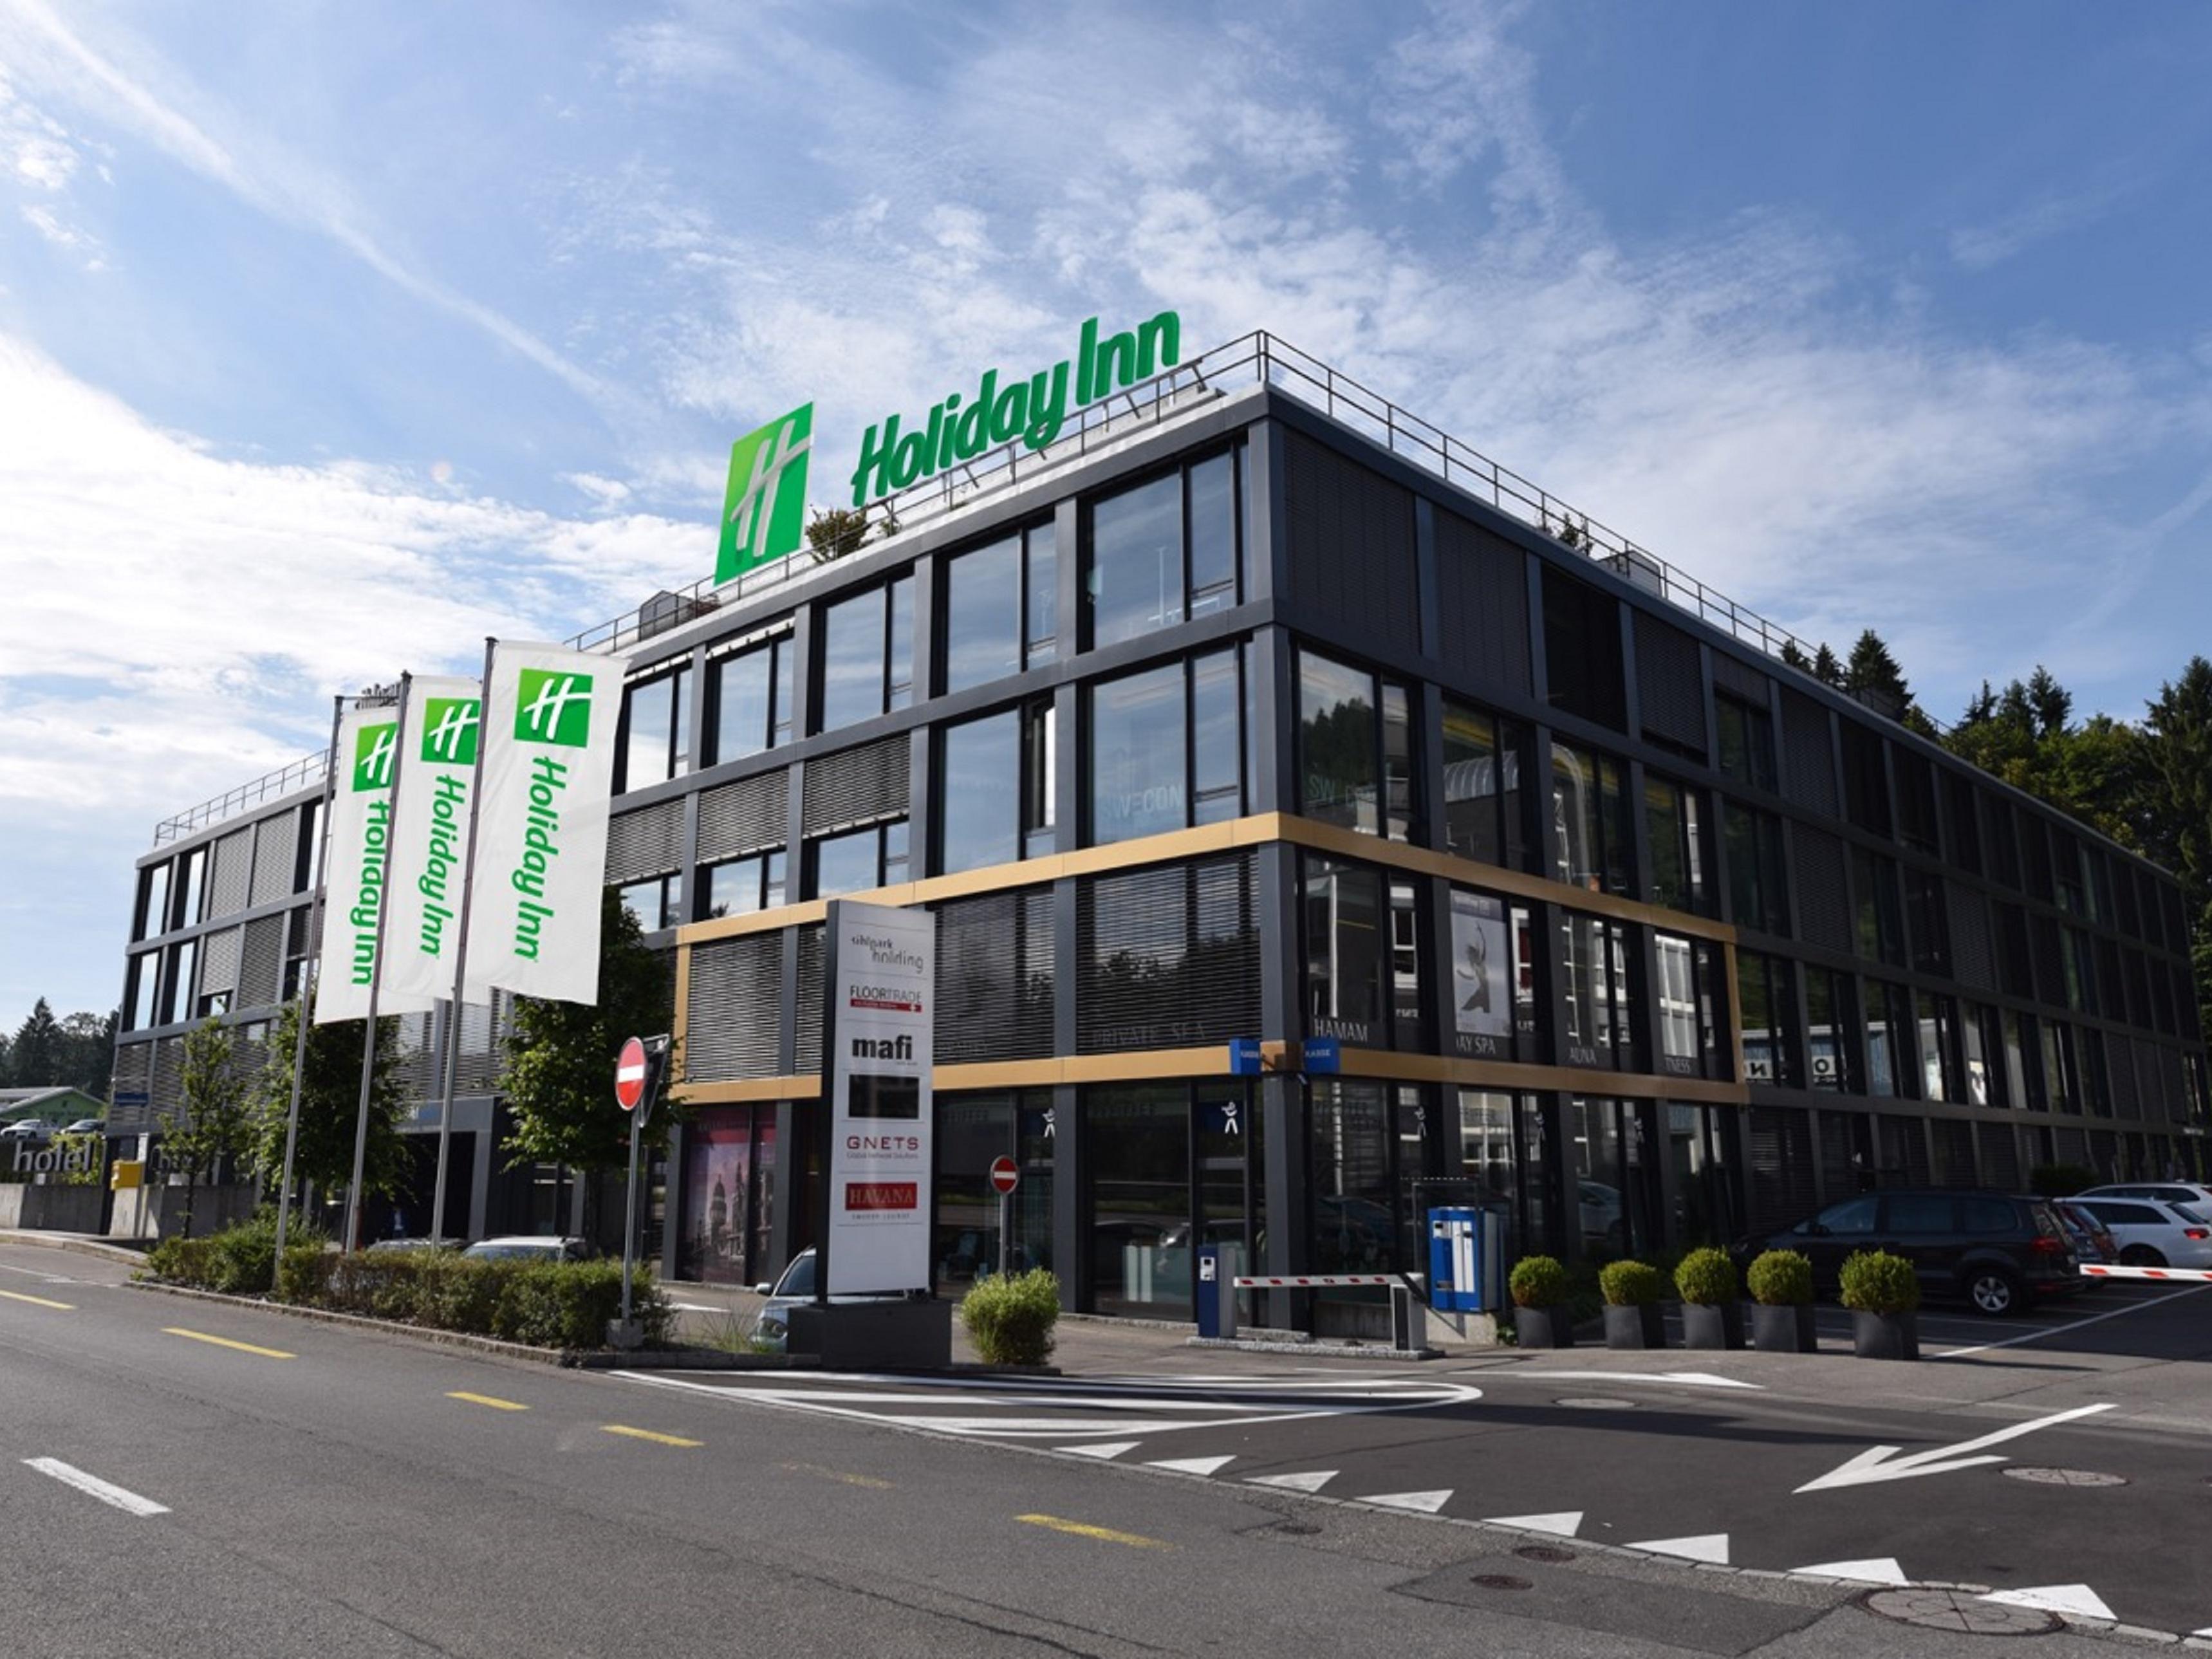 Holiday Inn Hotels In Switzerland